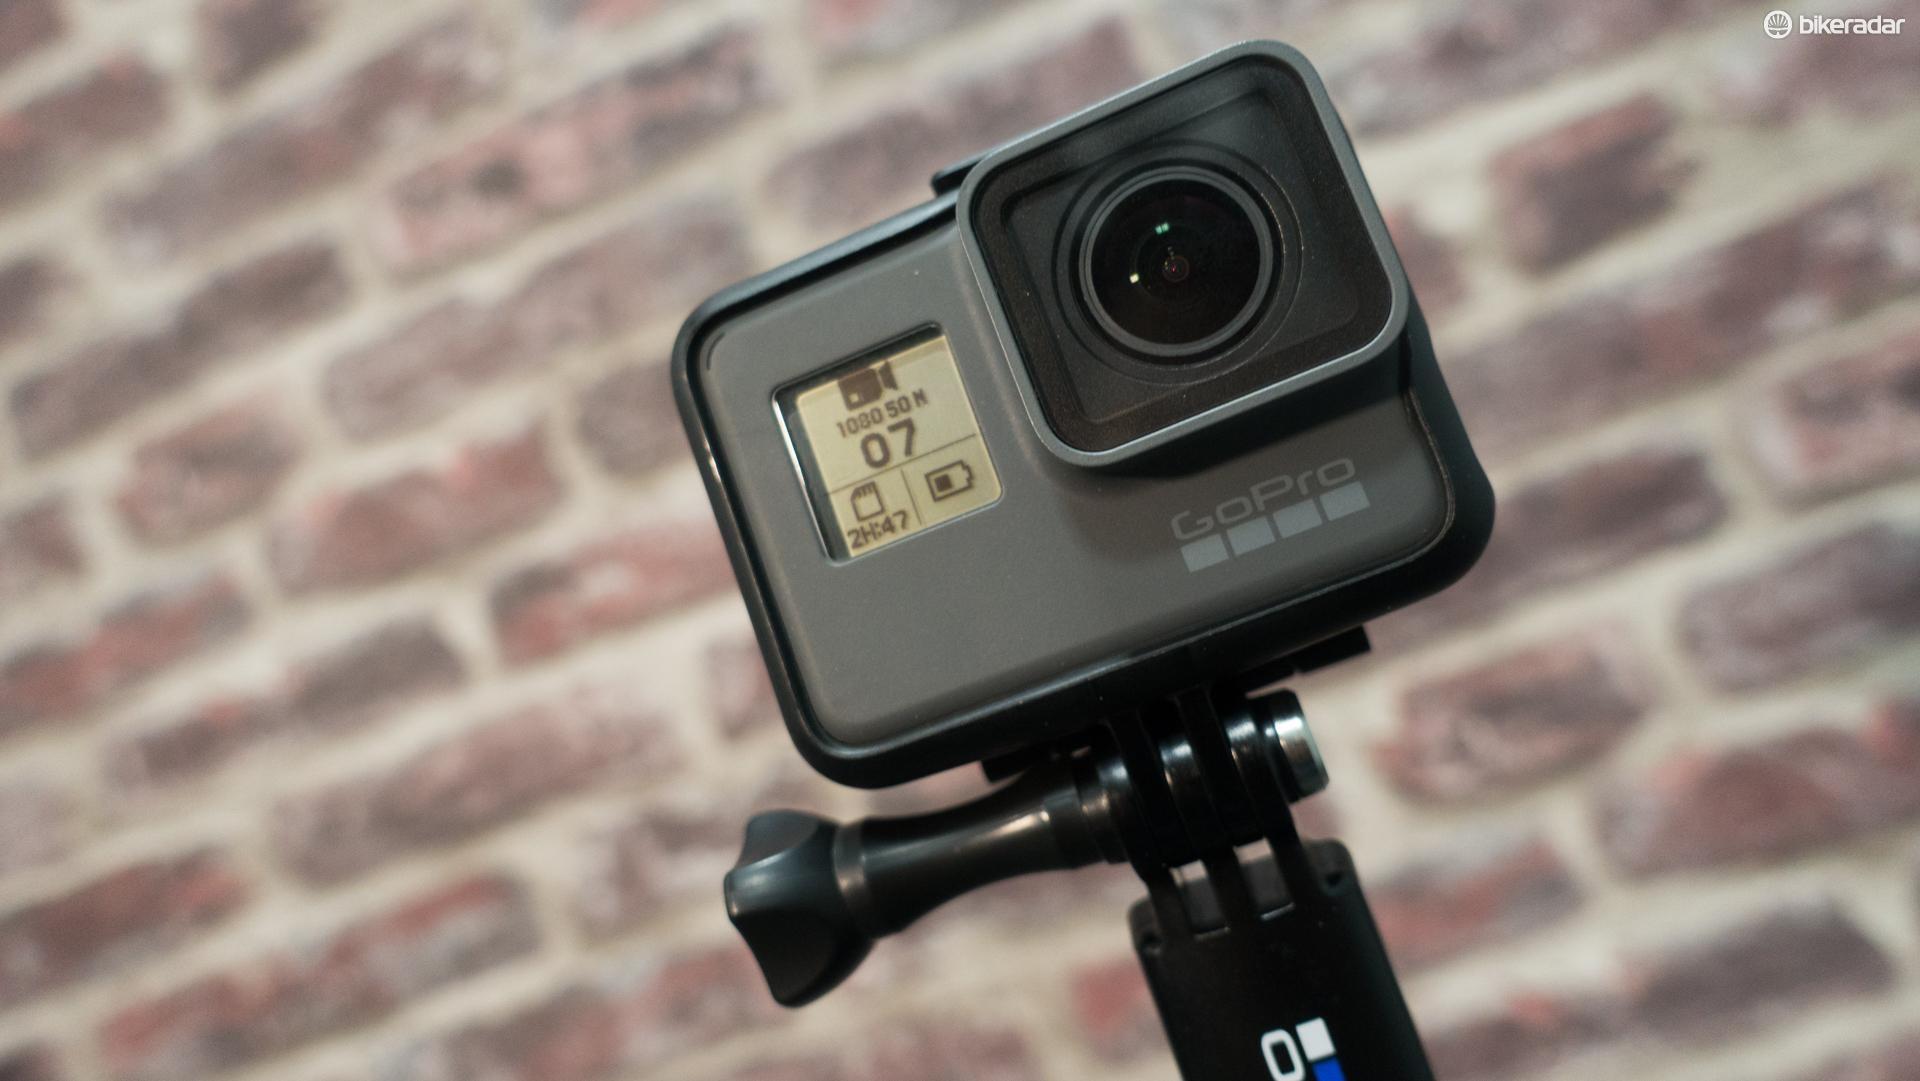 GoPro Hero 5 Black vs Hero 5 Session action cameras compared